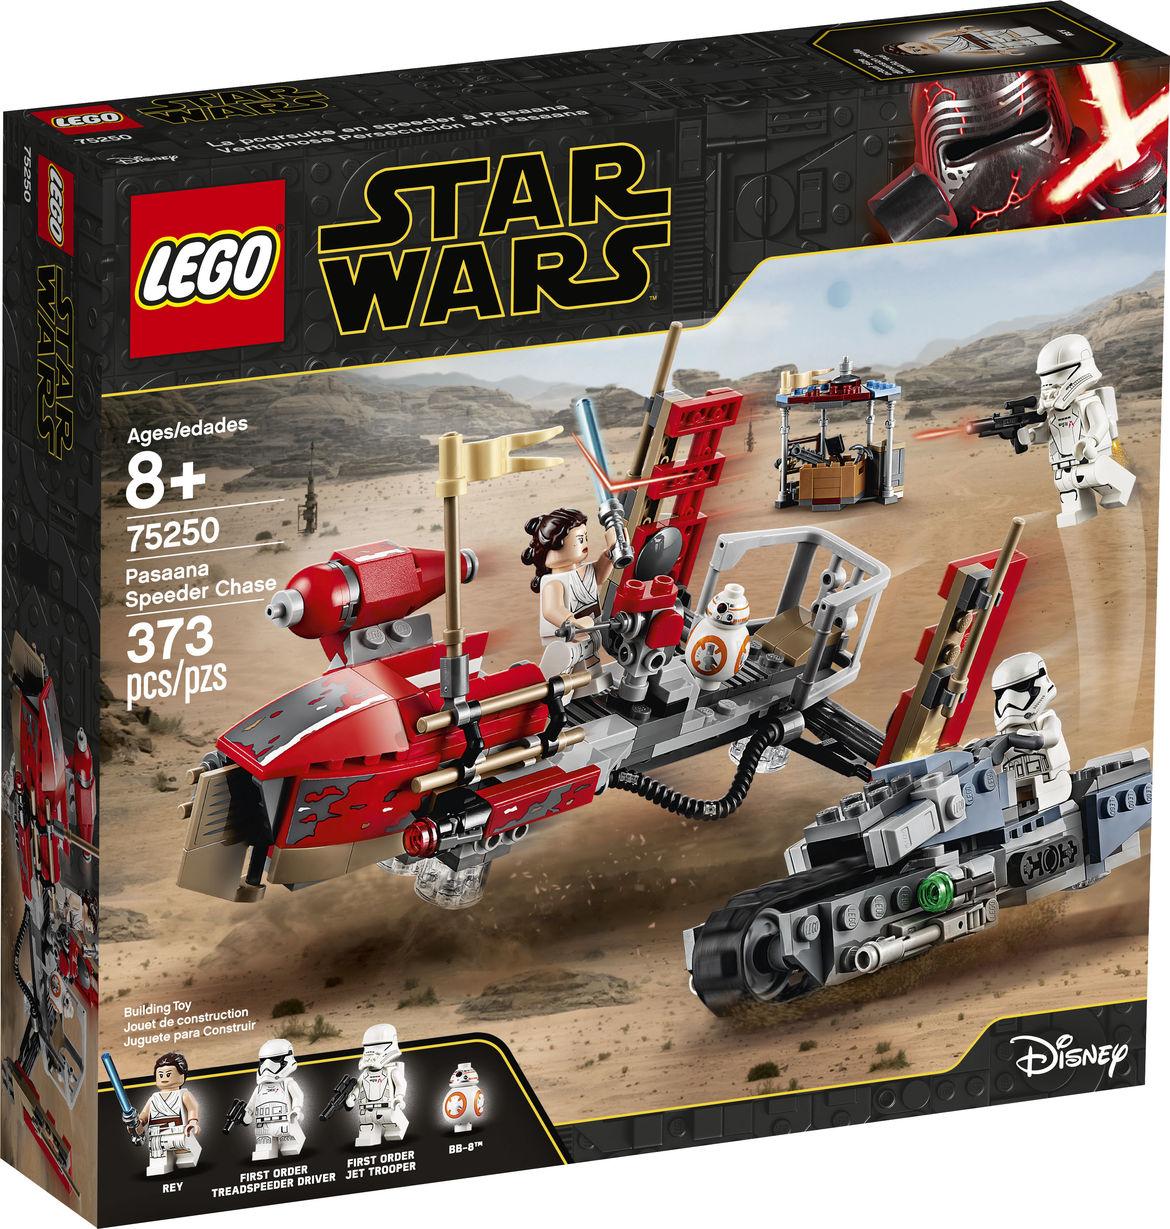 Triple Force Friday Lego Set Reveals Star Wars Rise Of Skywalker Treadspeeder